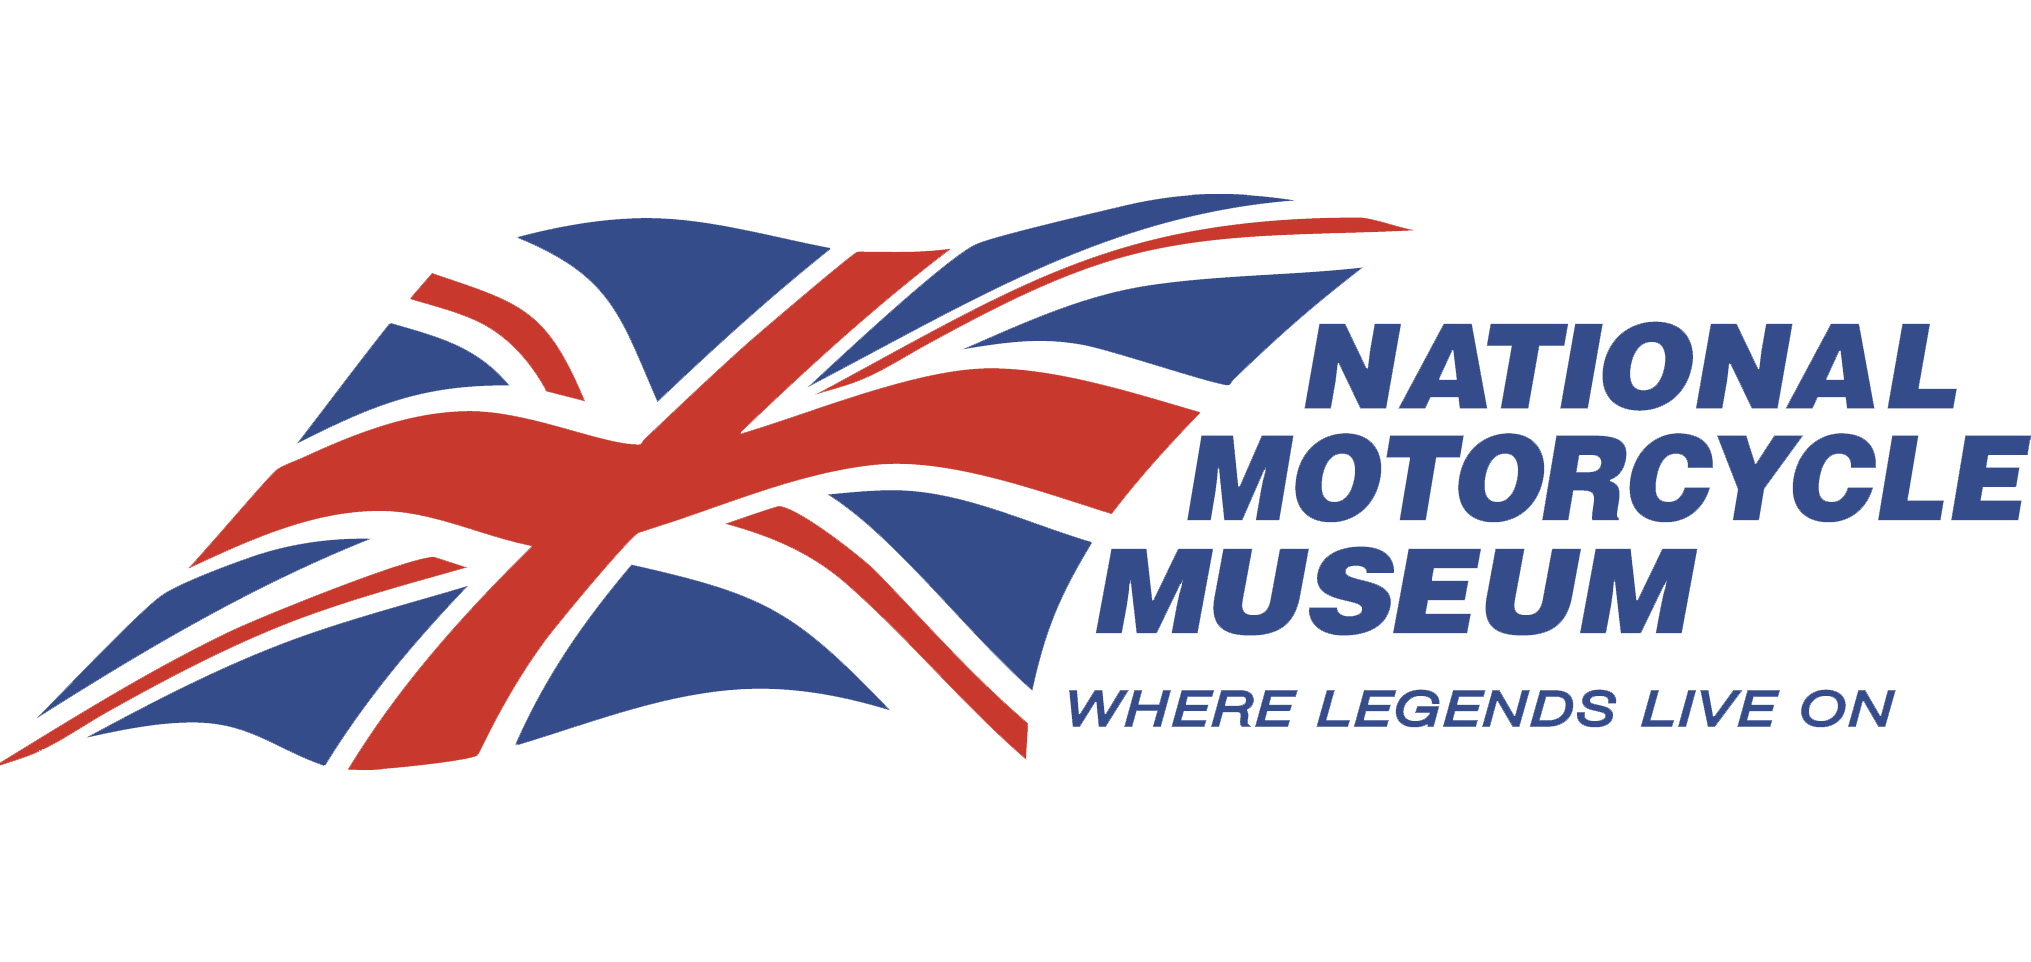 National Motorcycle Museum >> National Motorcycle Museum Solihull Birmingham West Midlands